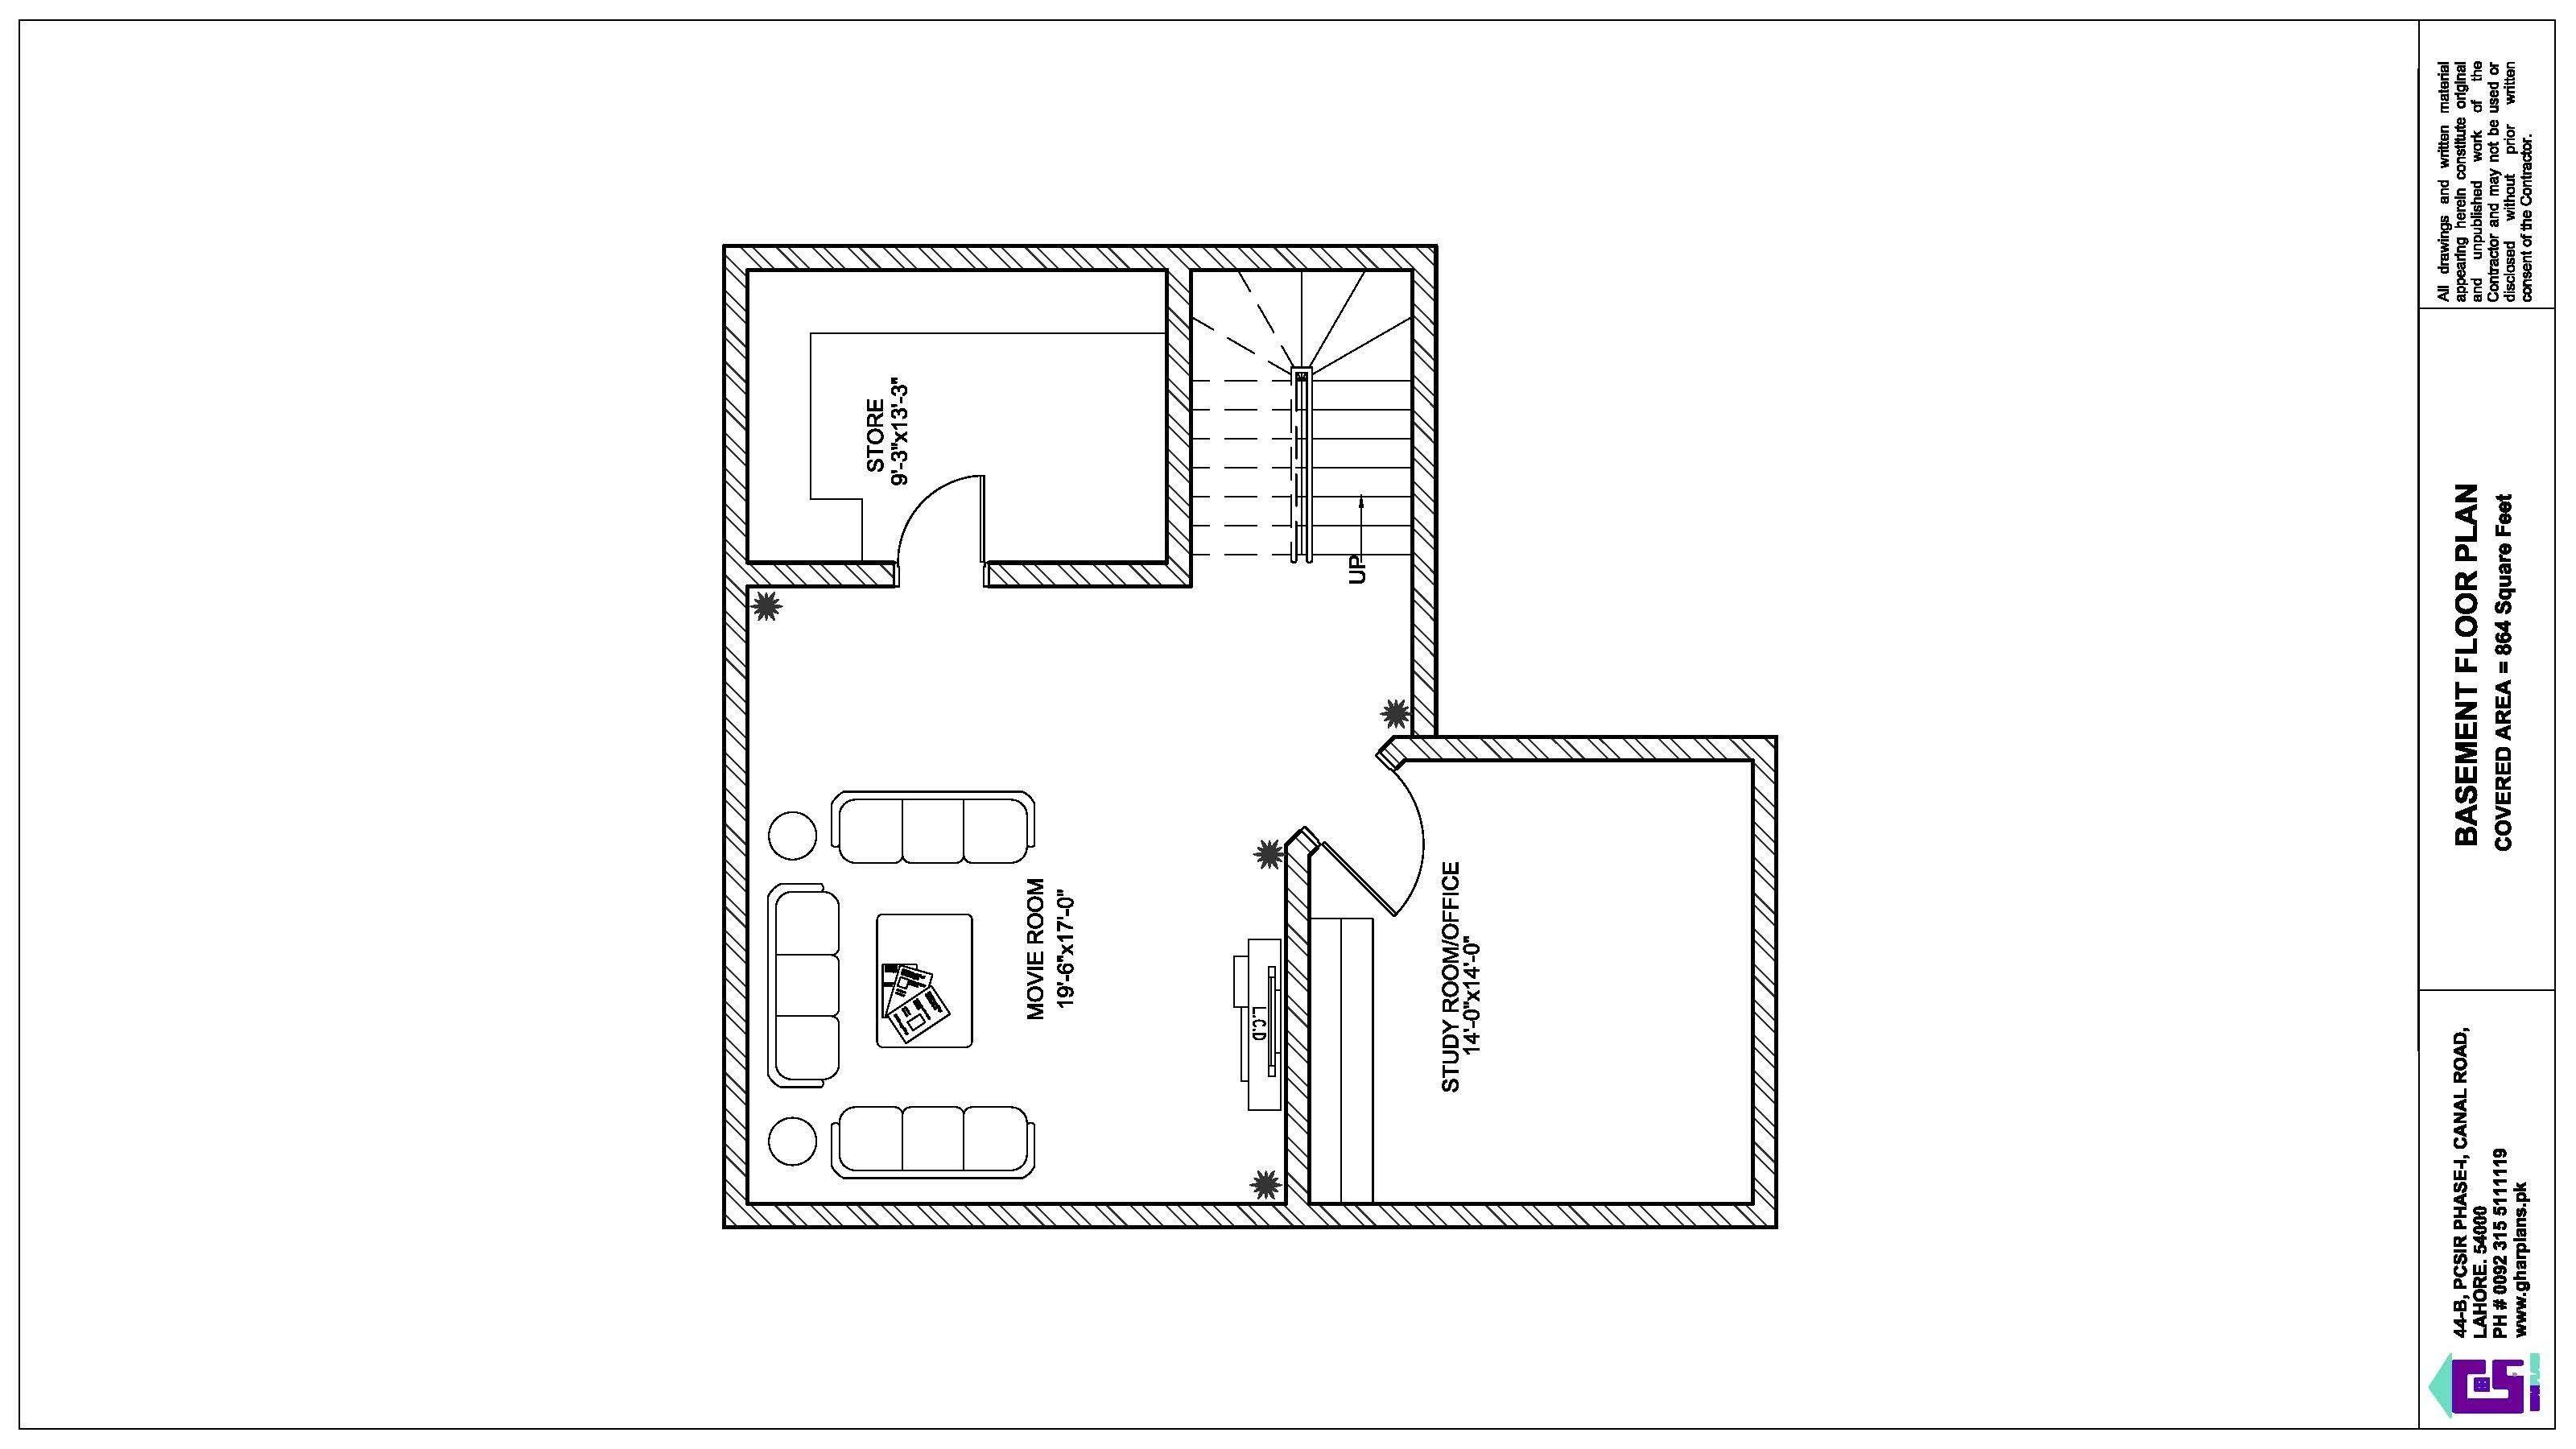 10 Marla House Basement Floor Plan Basement Floor Homeofficedesignlayoutsquarefeet Hous Basement Floor Plans Basement House Floor Plan Layout